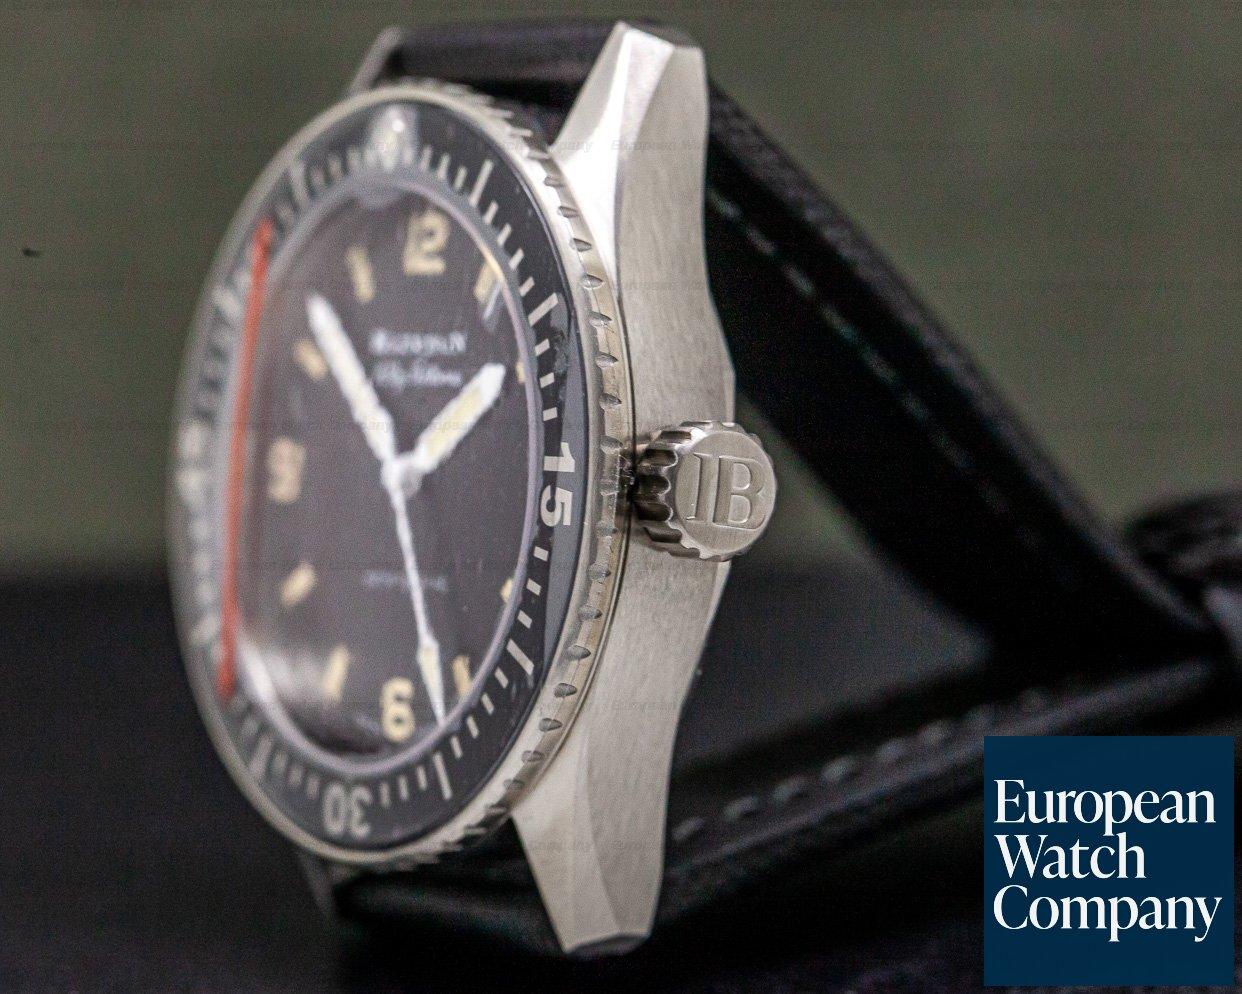 Blancpain 5100-1110-63a Fifty Fathoms 38mm Bathyscaphe for HODINKEE UNWORN